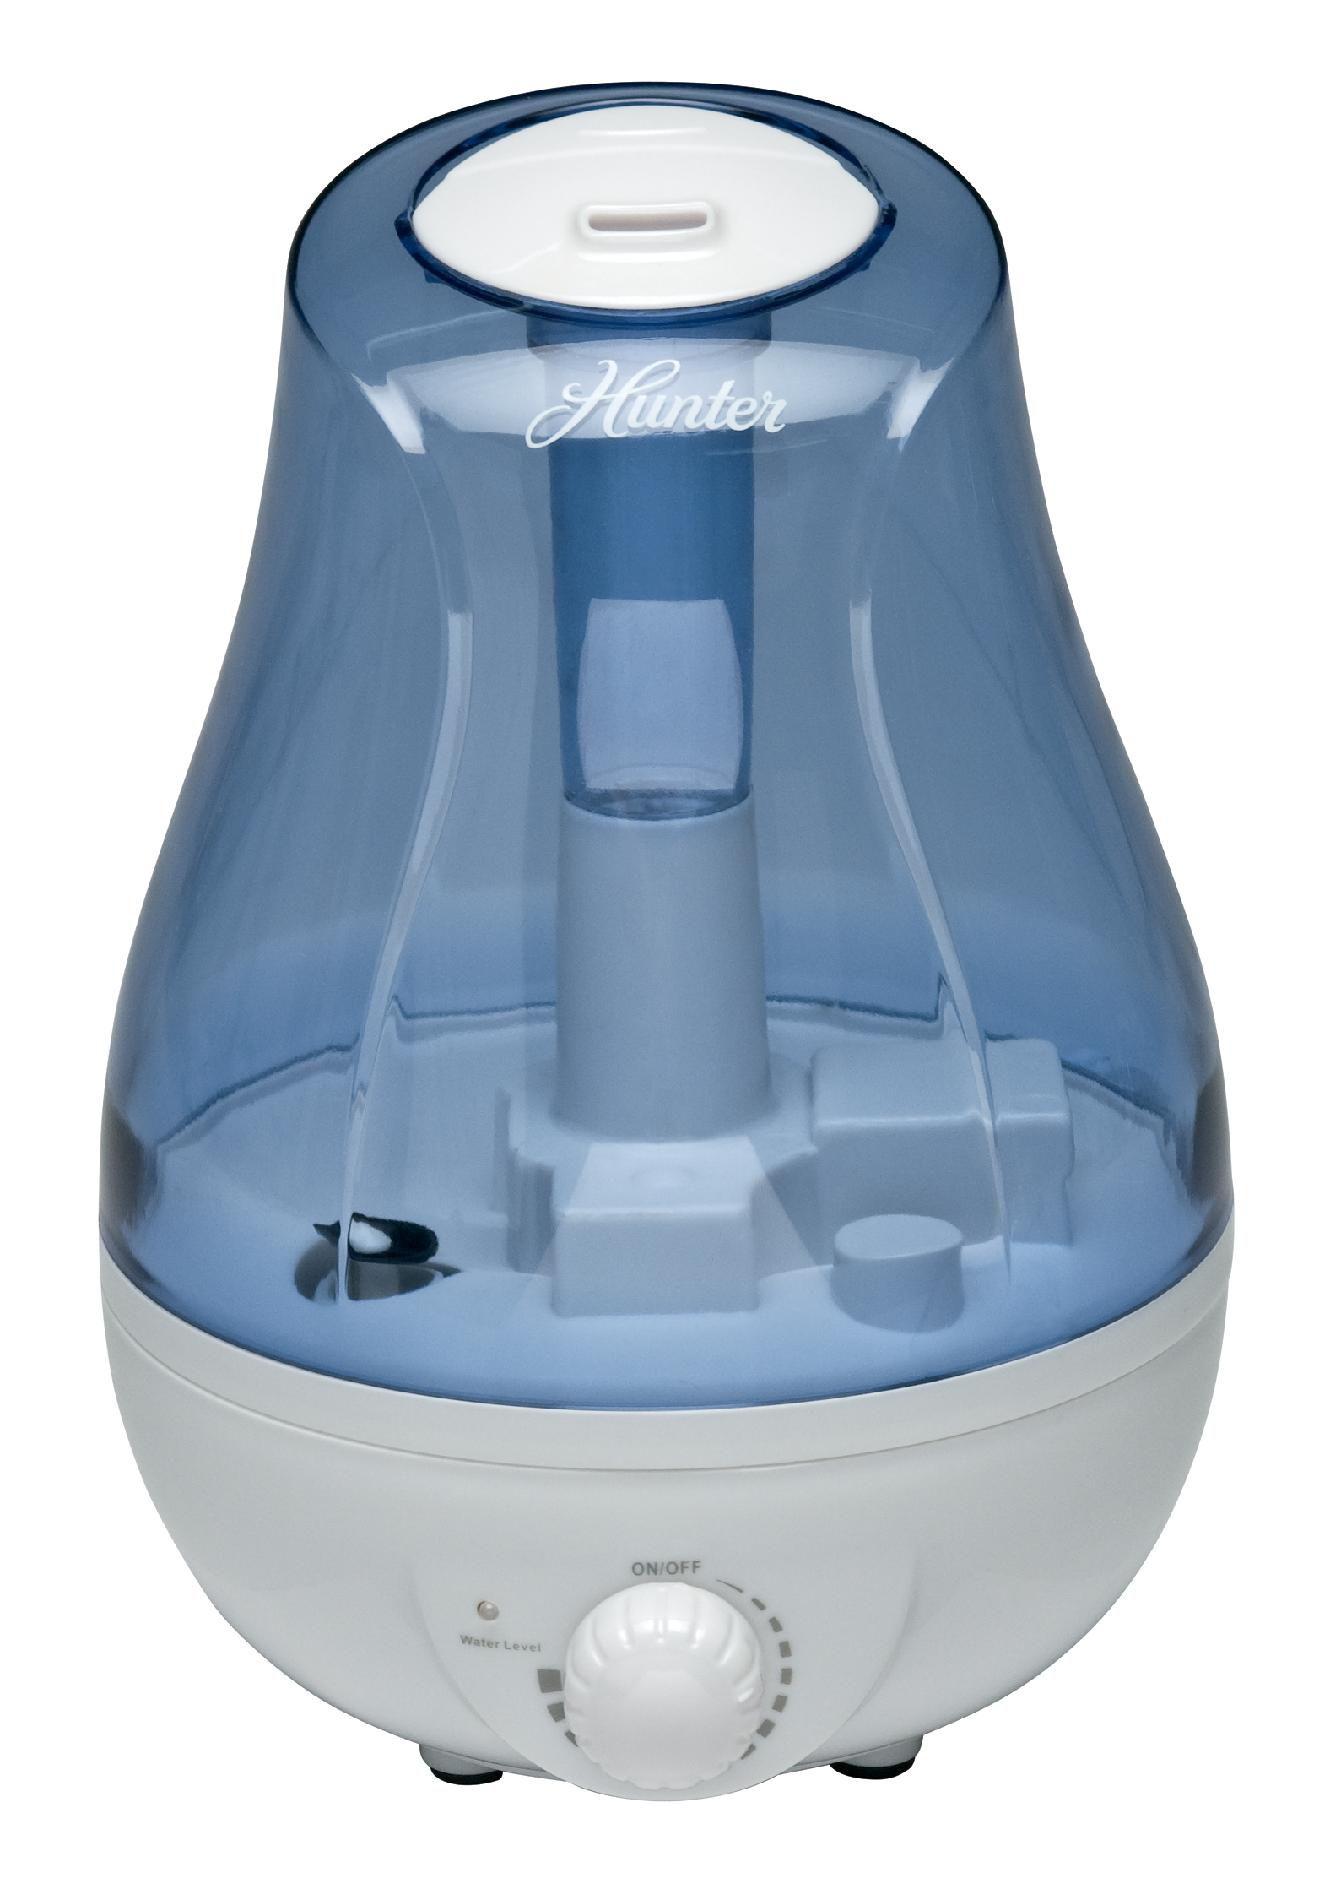 Hunter Fan Company H Ultrasonic Humidifier